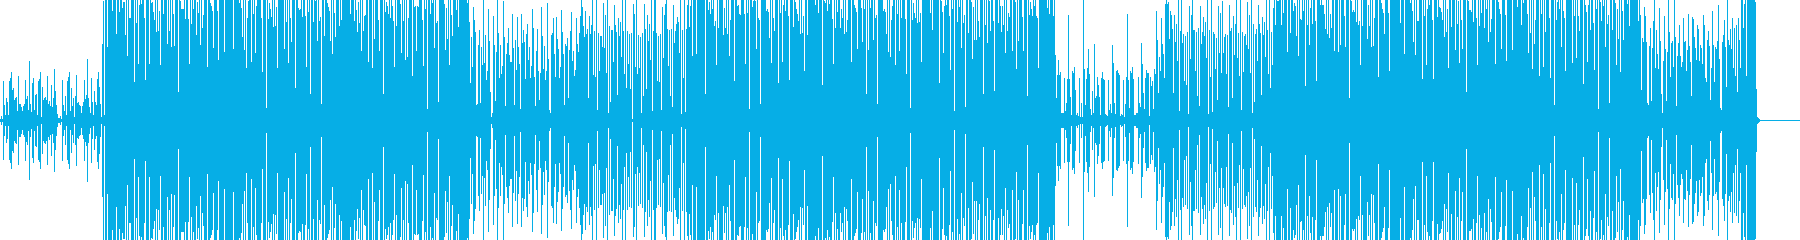 House music / Vogueの再生済みの波形